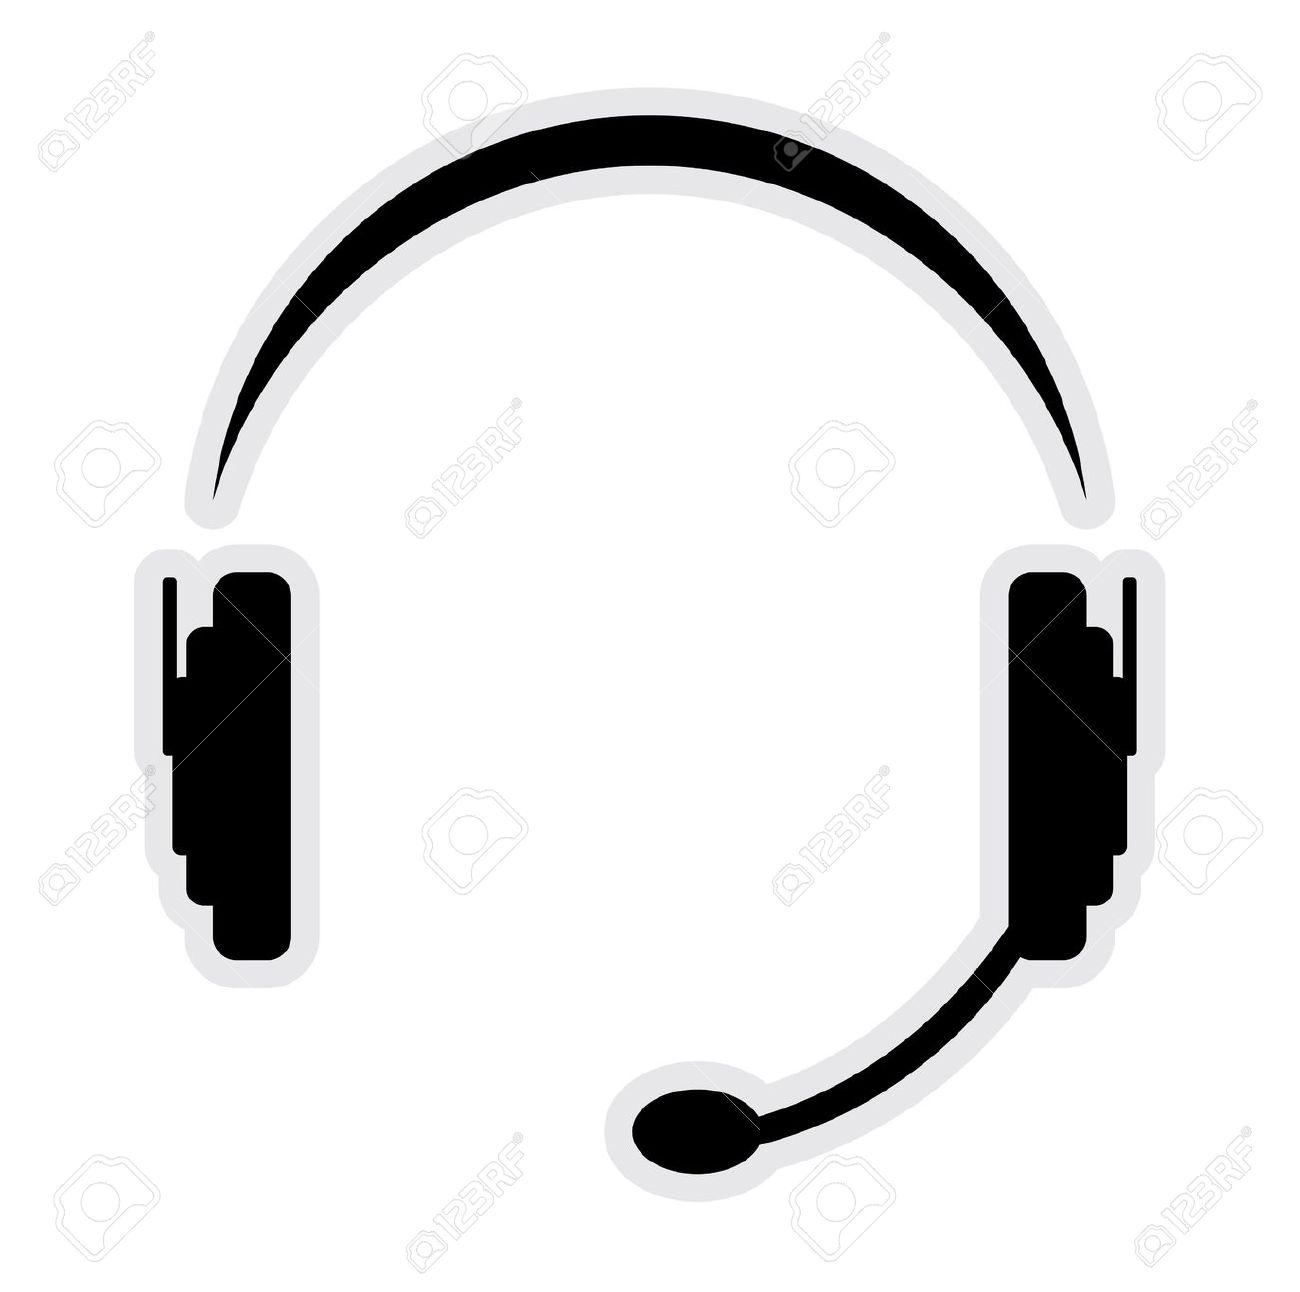 Telephone headset clipart.